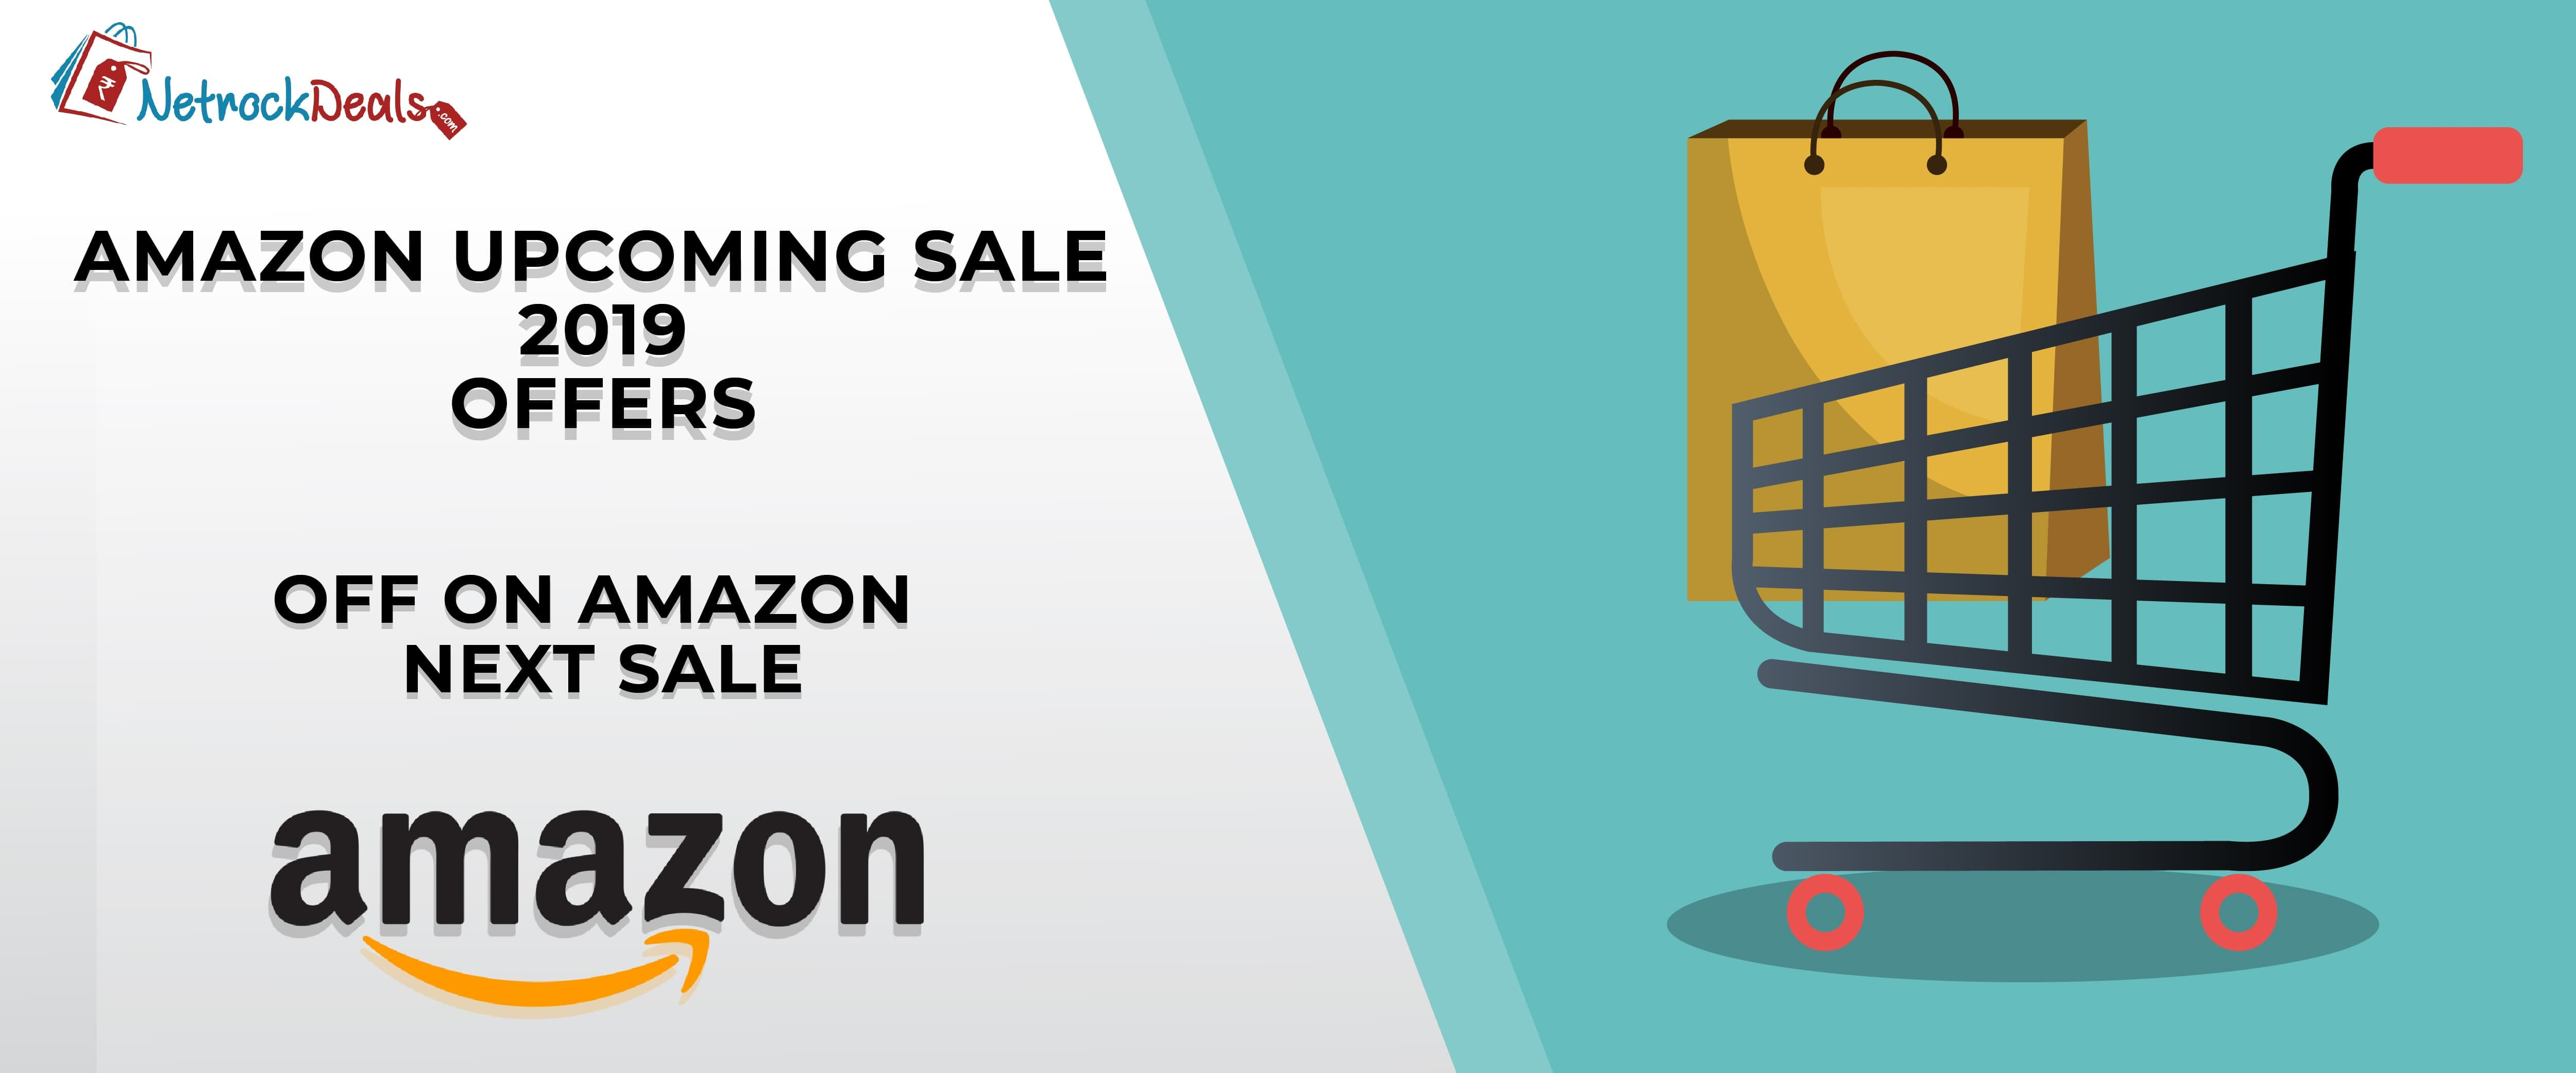 Amazon Upcomming Sale